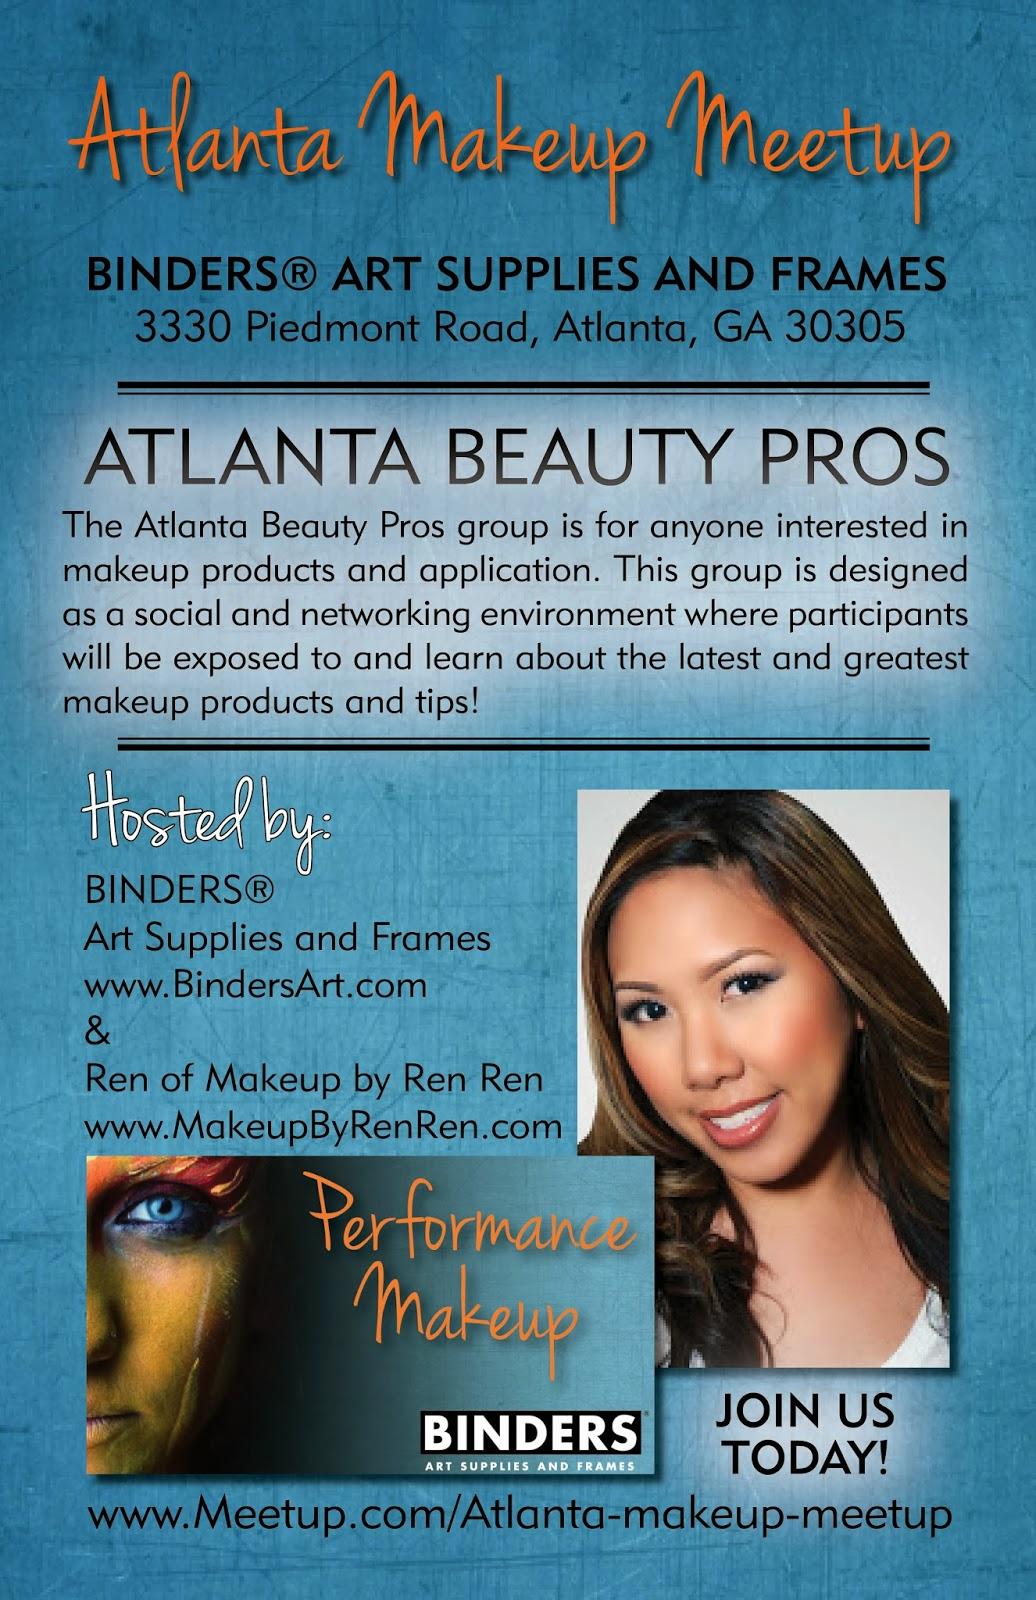 March Makeup Meet-Up - Lashes & Brows! | Makeup By RenRen